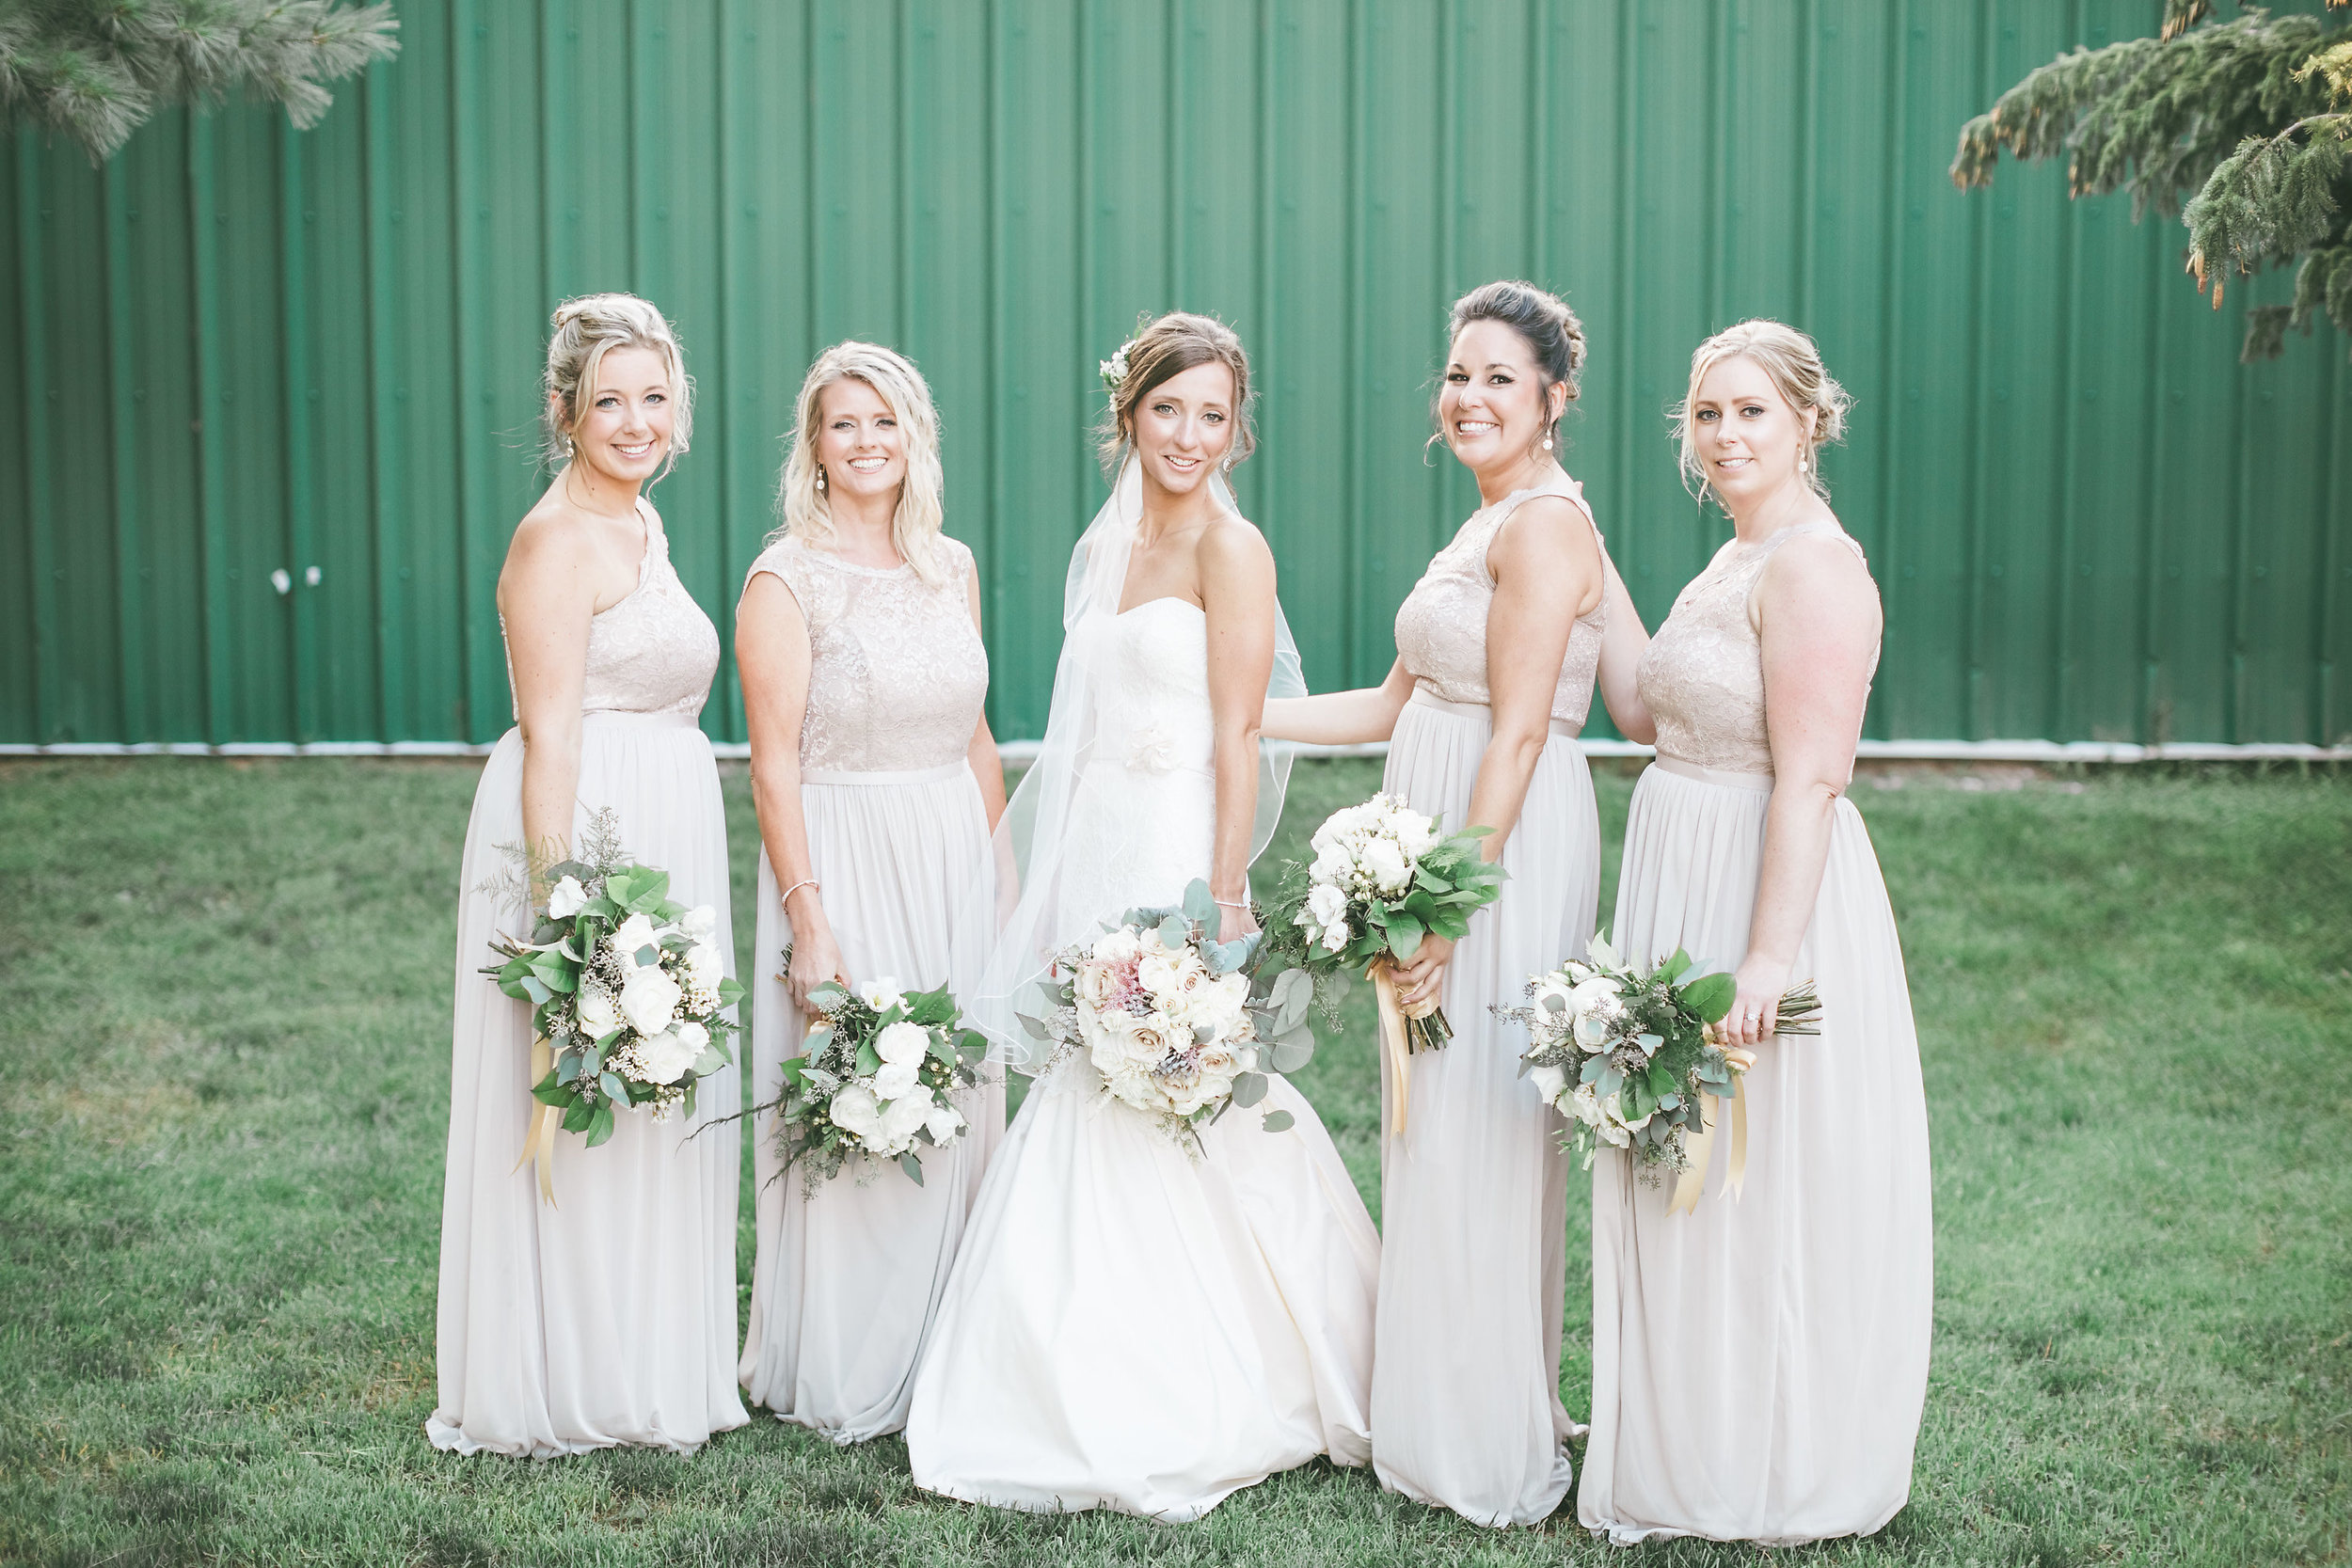 meaghan___darryl_wedding___danielcarusophotography___0959.jpg